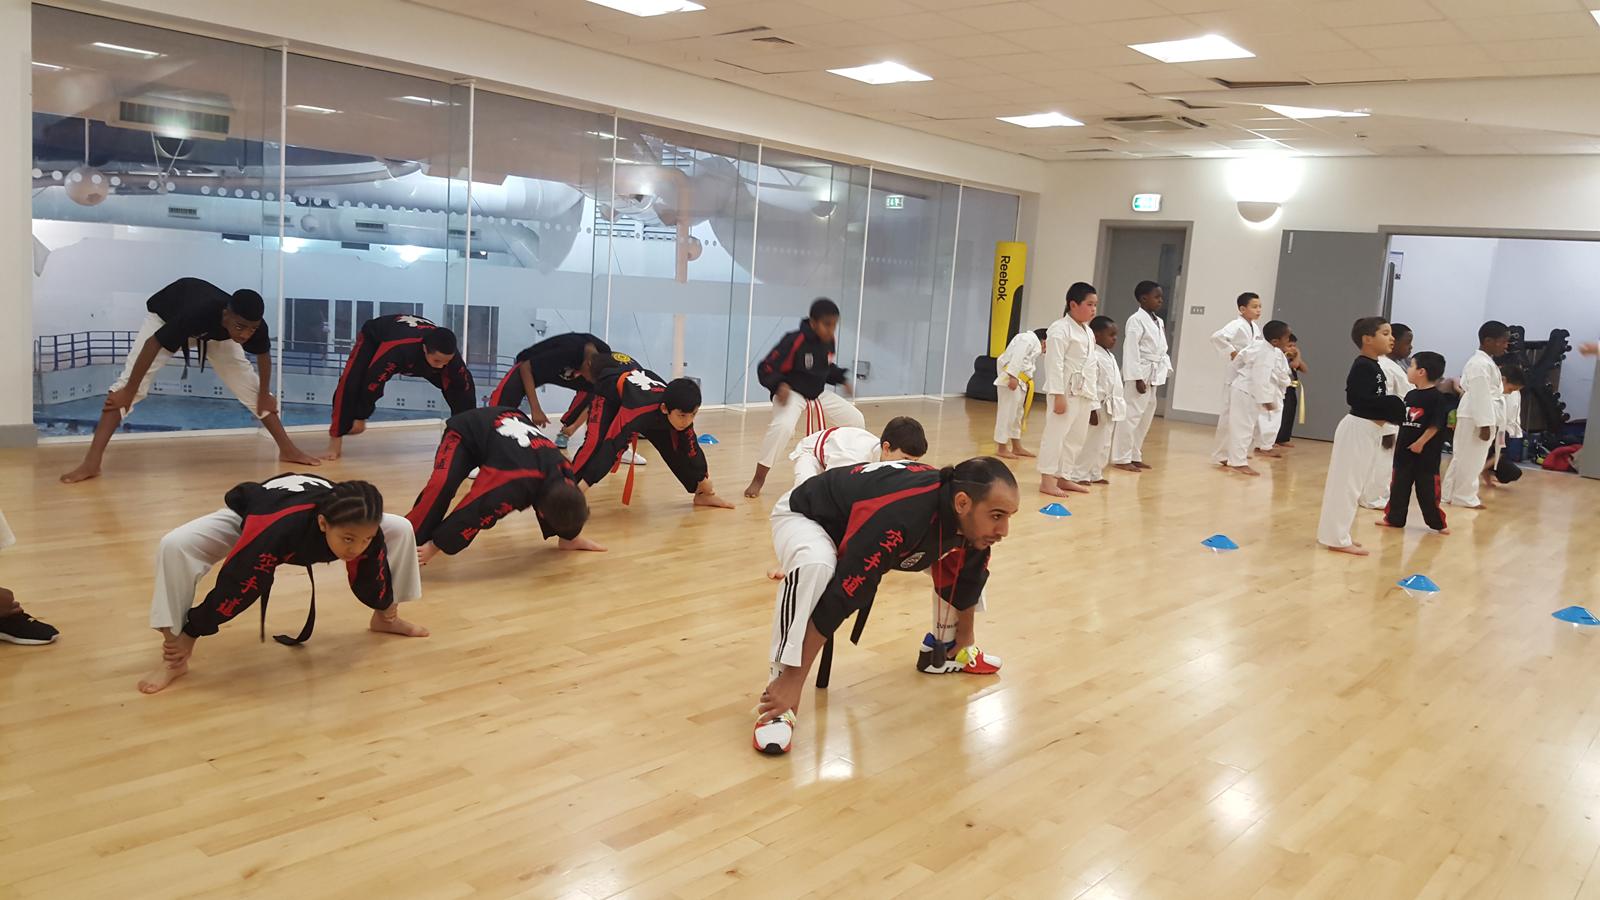 Fitness training at Wavelengths